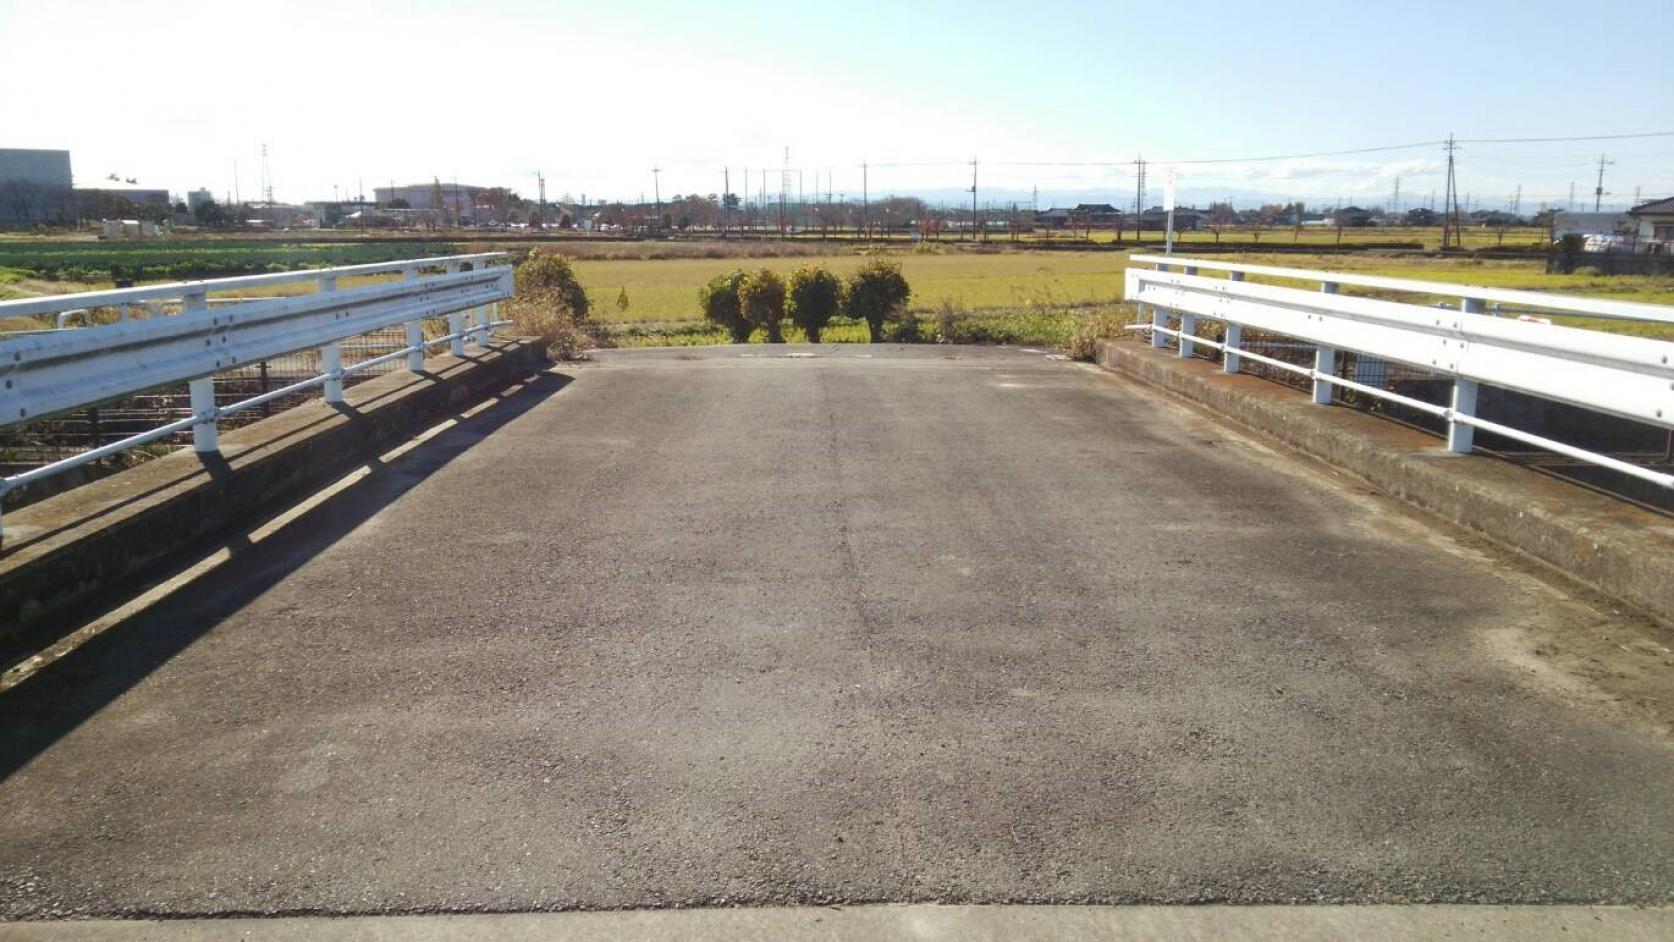 土木工学科 構造・デザイン研究室、卒業研究成果を埼玉県加須市長に報告